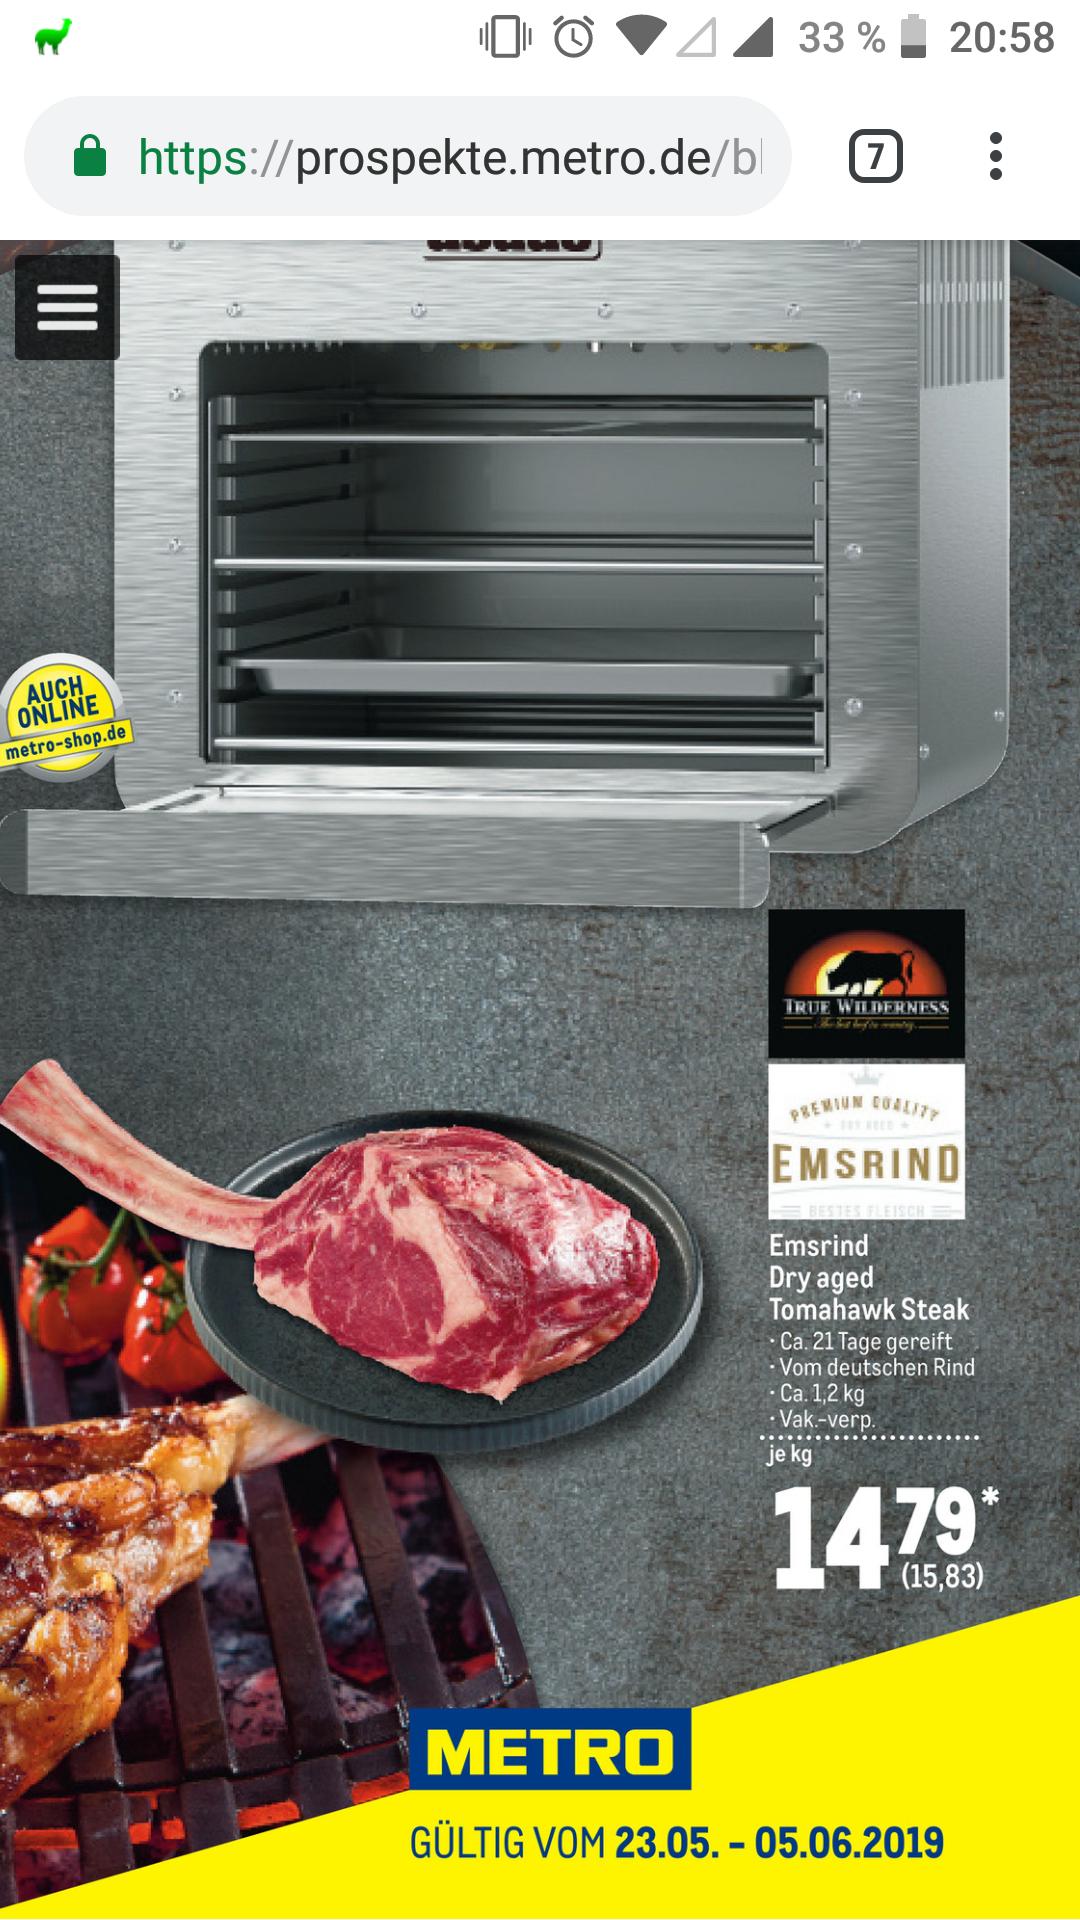 [METRO] EMSRIND Dry Aged Tomahawk Steak kg-Preis 15,83 €